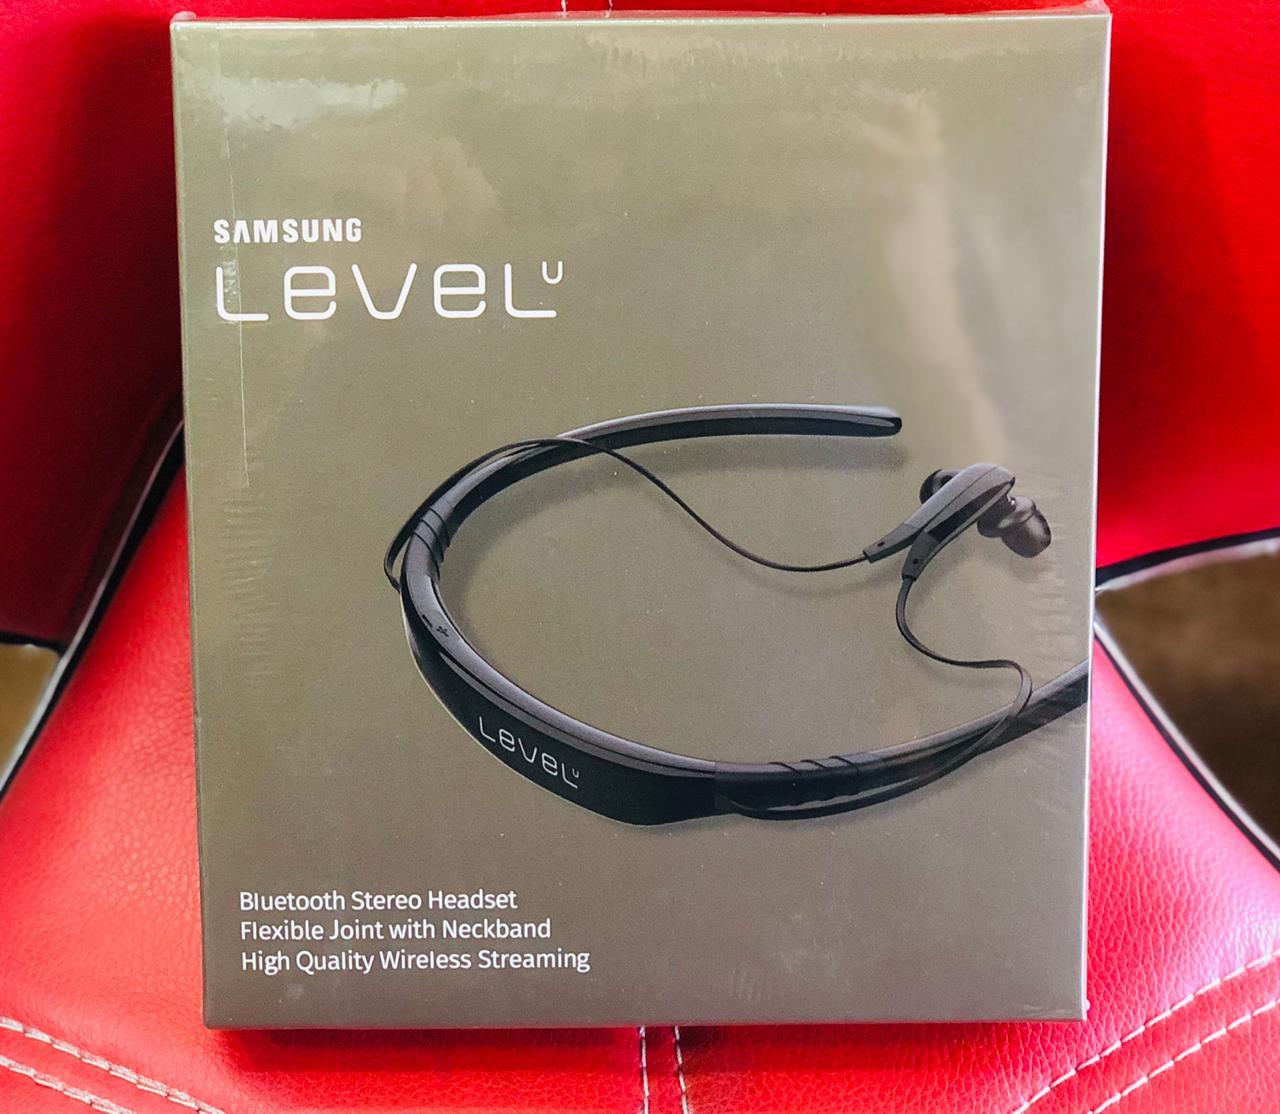 Samsung Level U Bluetooth Wireless In Ear Headphones With Microphone